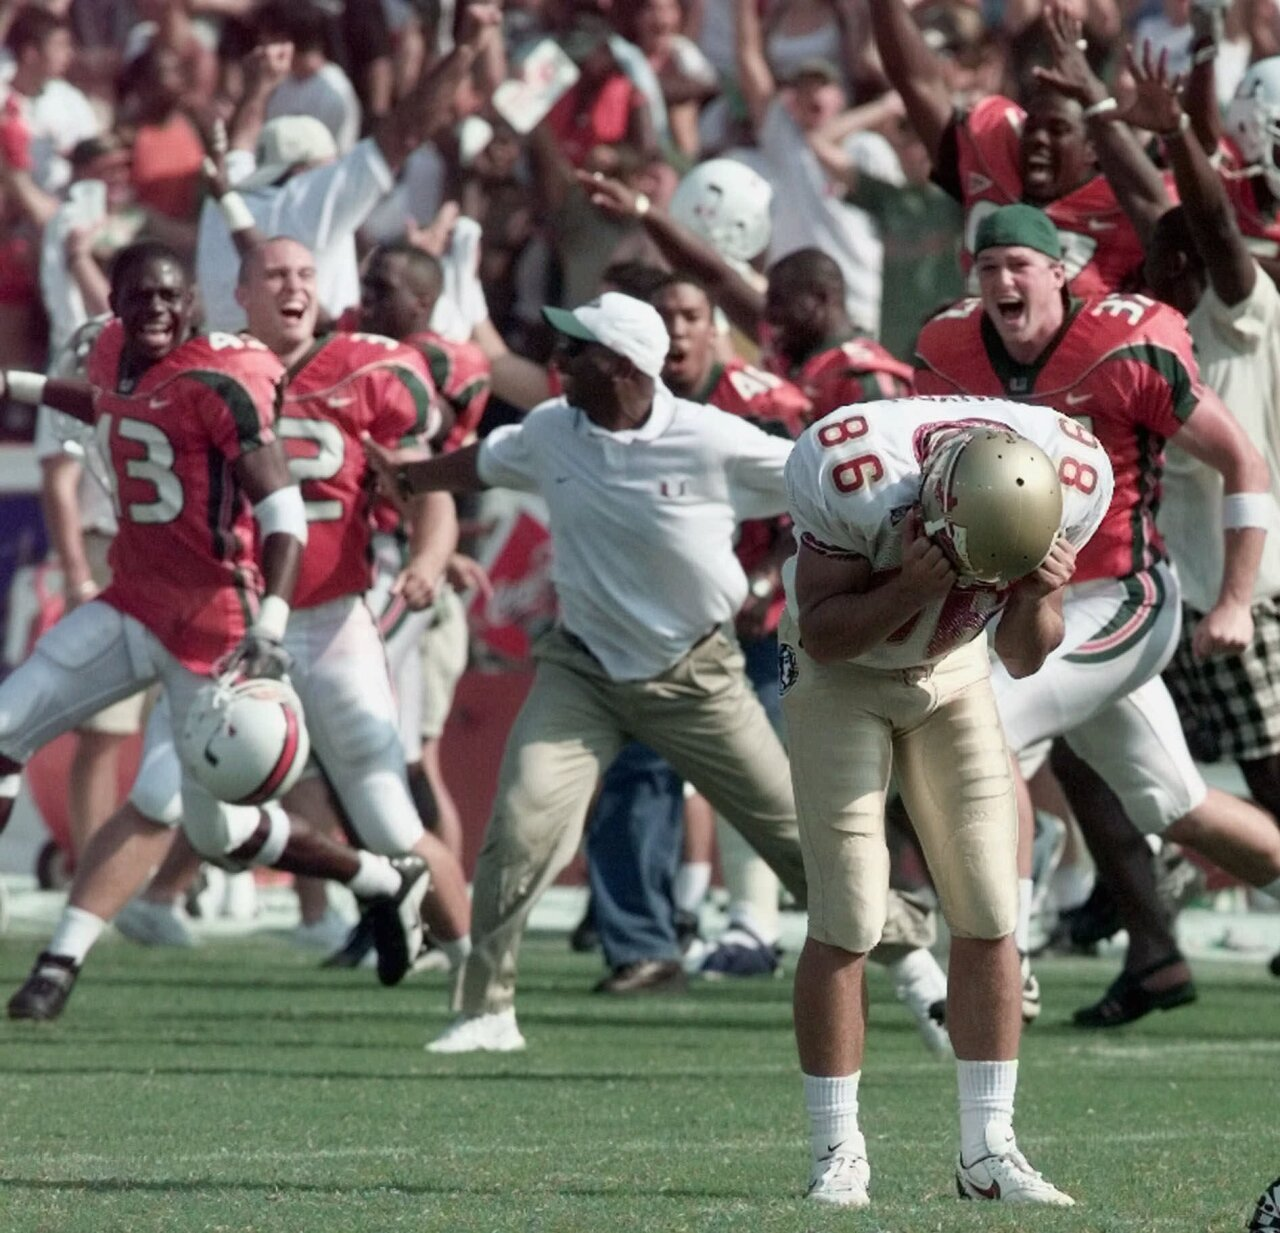 Florida State Seminoles kicker Matt Munyon clutches helmet after 'Wide Right III' against Miami Hurricanes in 2000